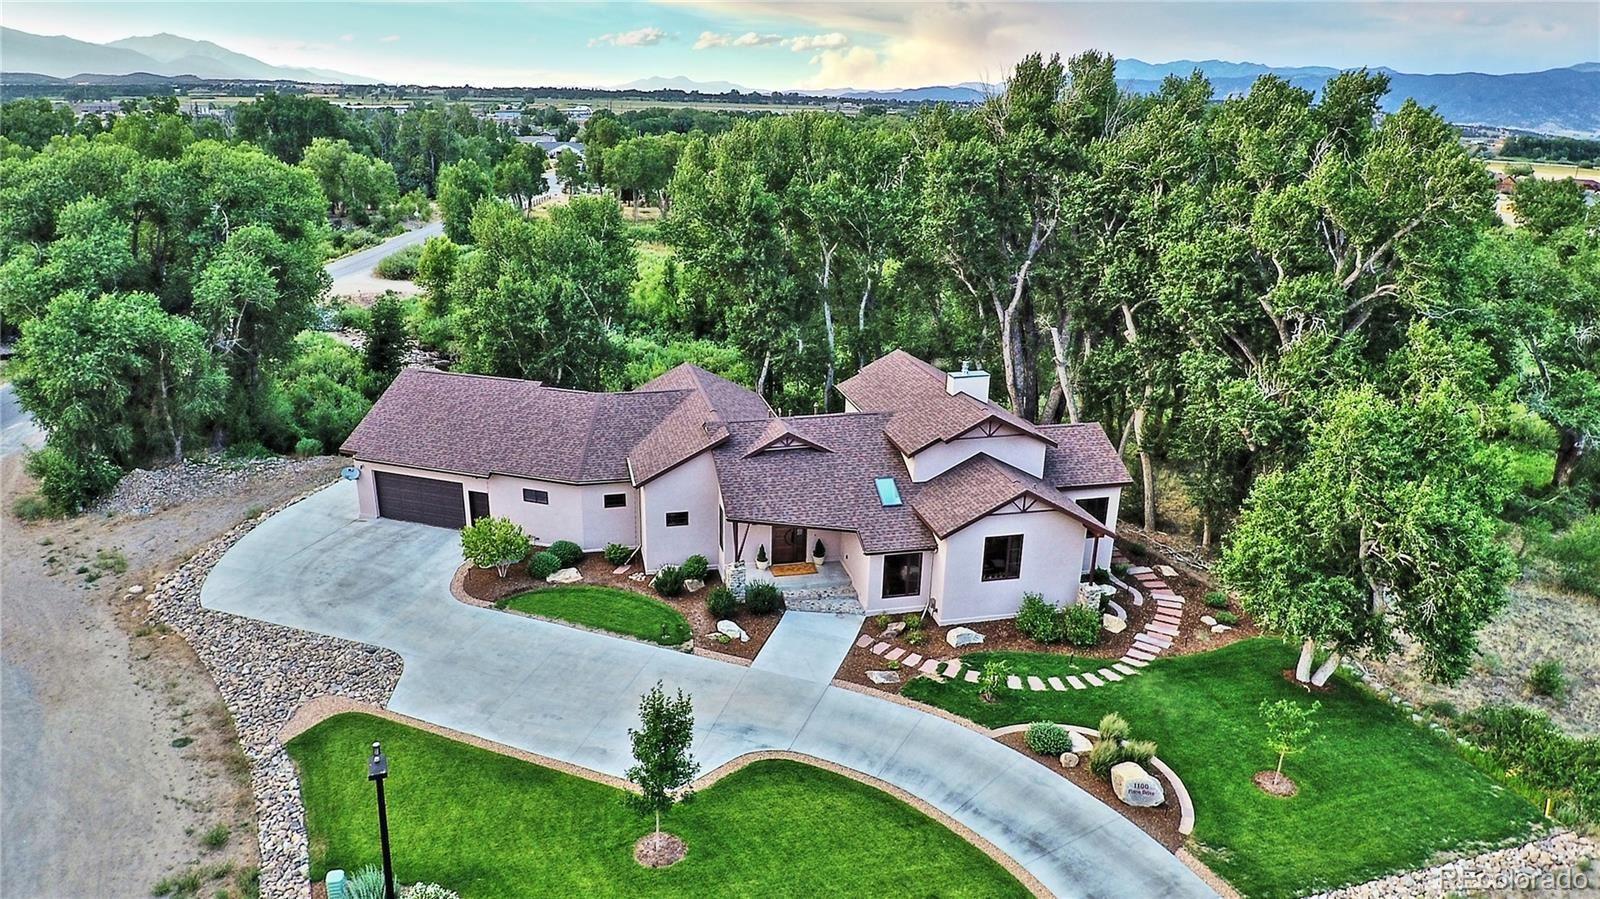 1100 Pinon Drive, Poncha Springs, CO 81242 - MLS#: 5933792